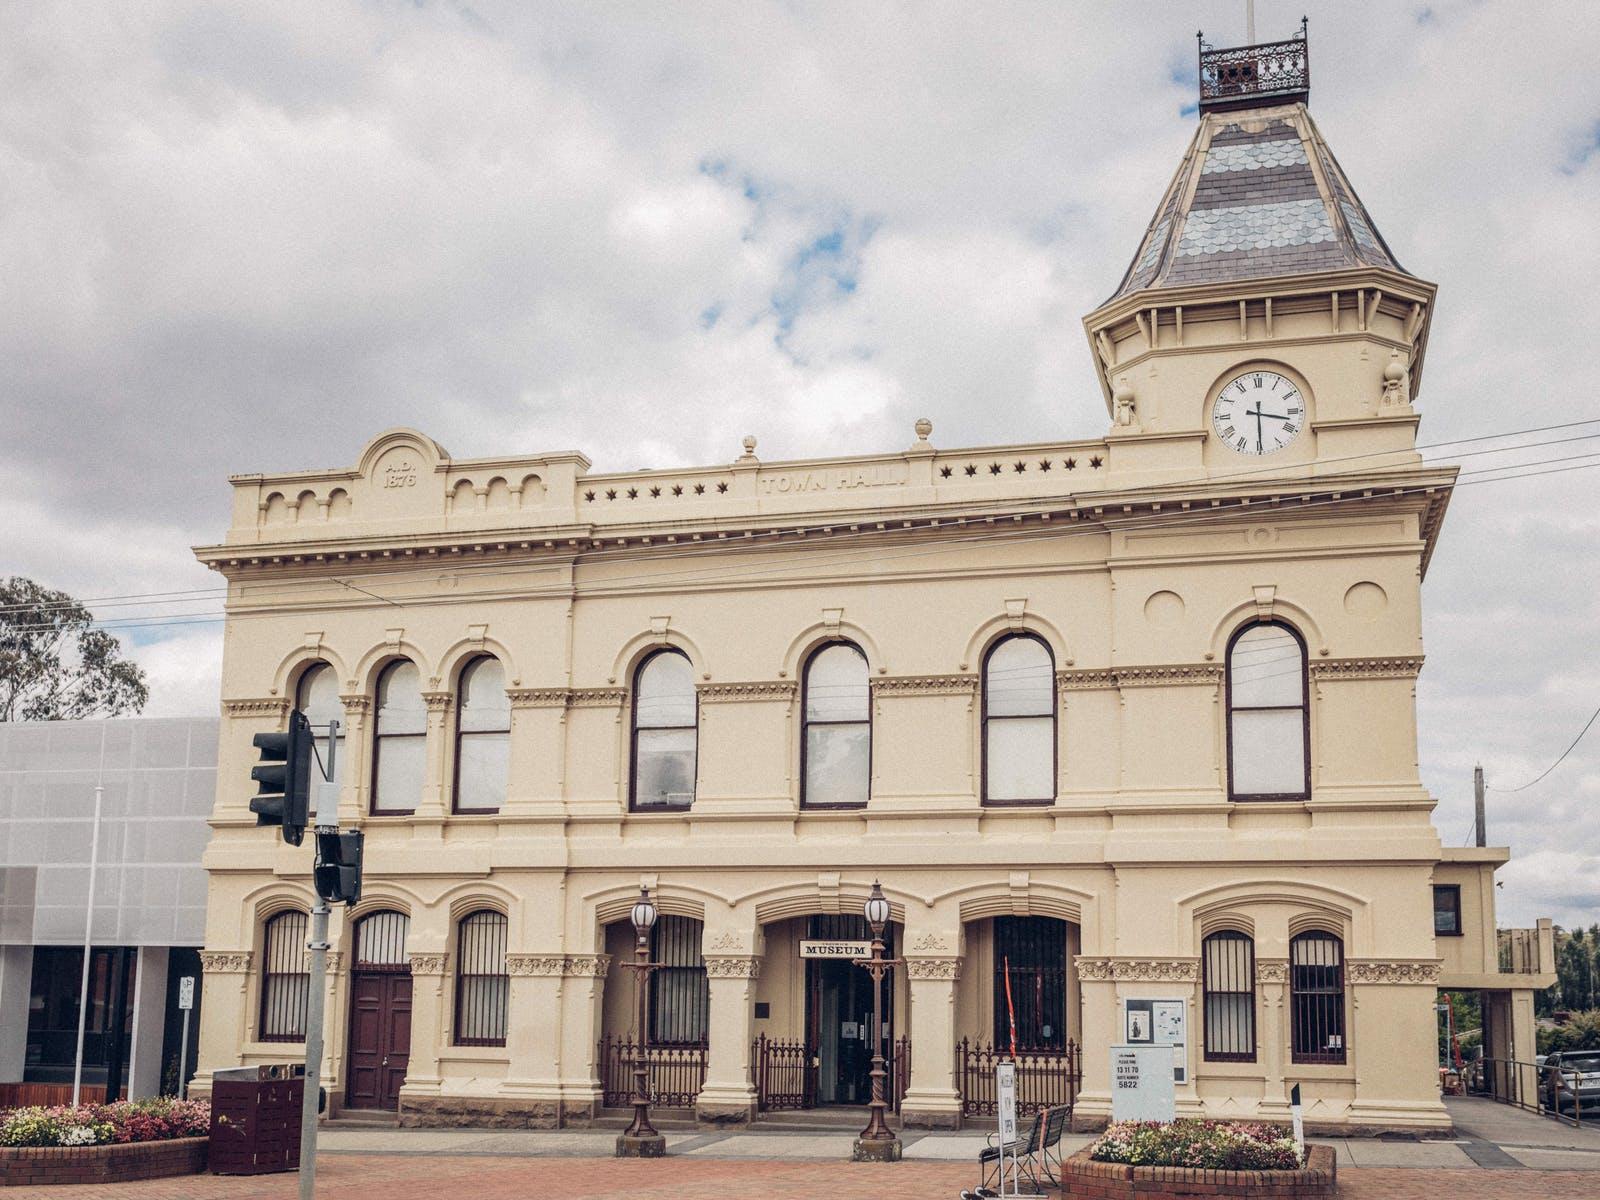 Creswick Town Hall